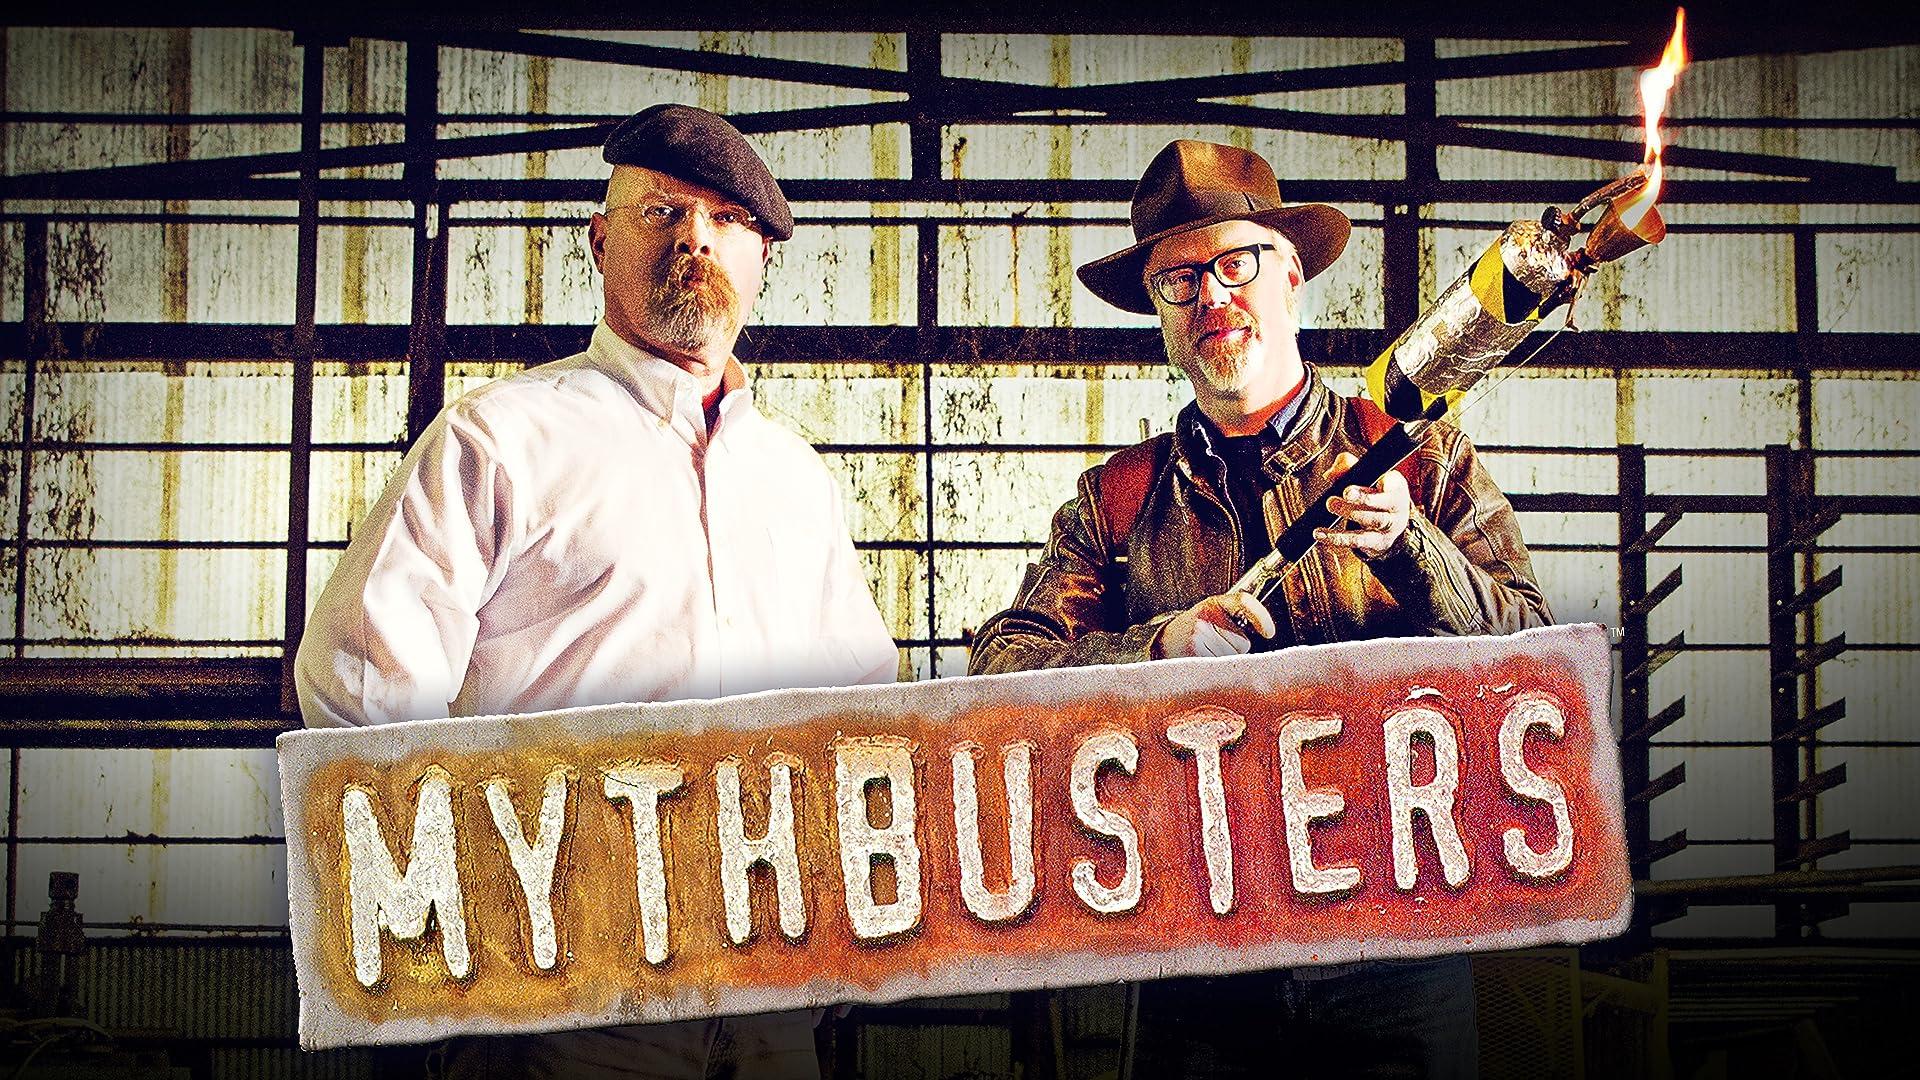 MythBusters - Season 1